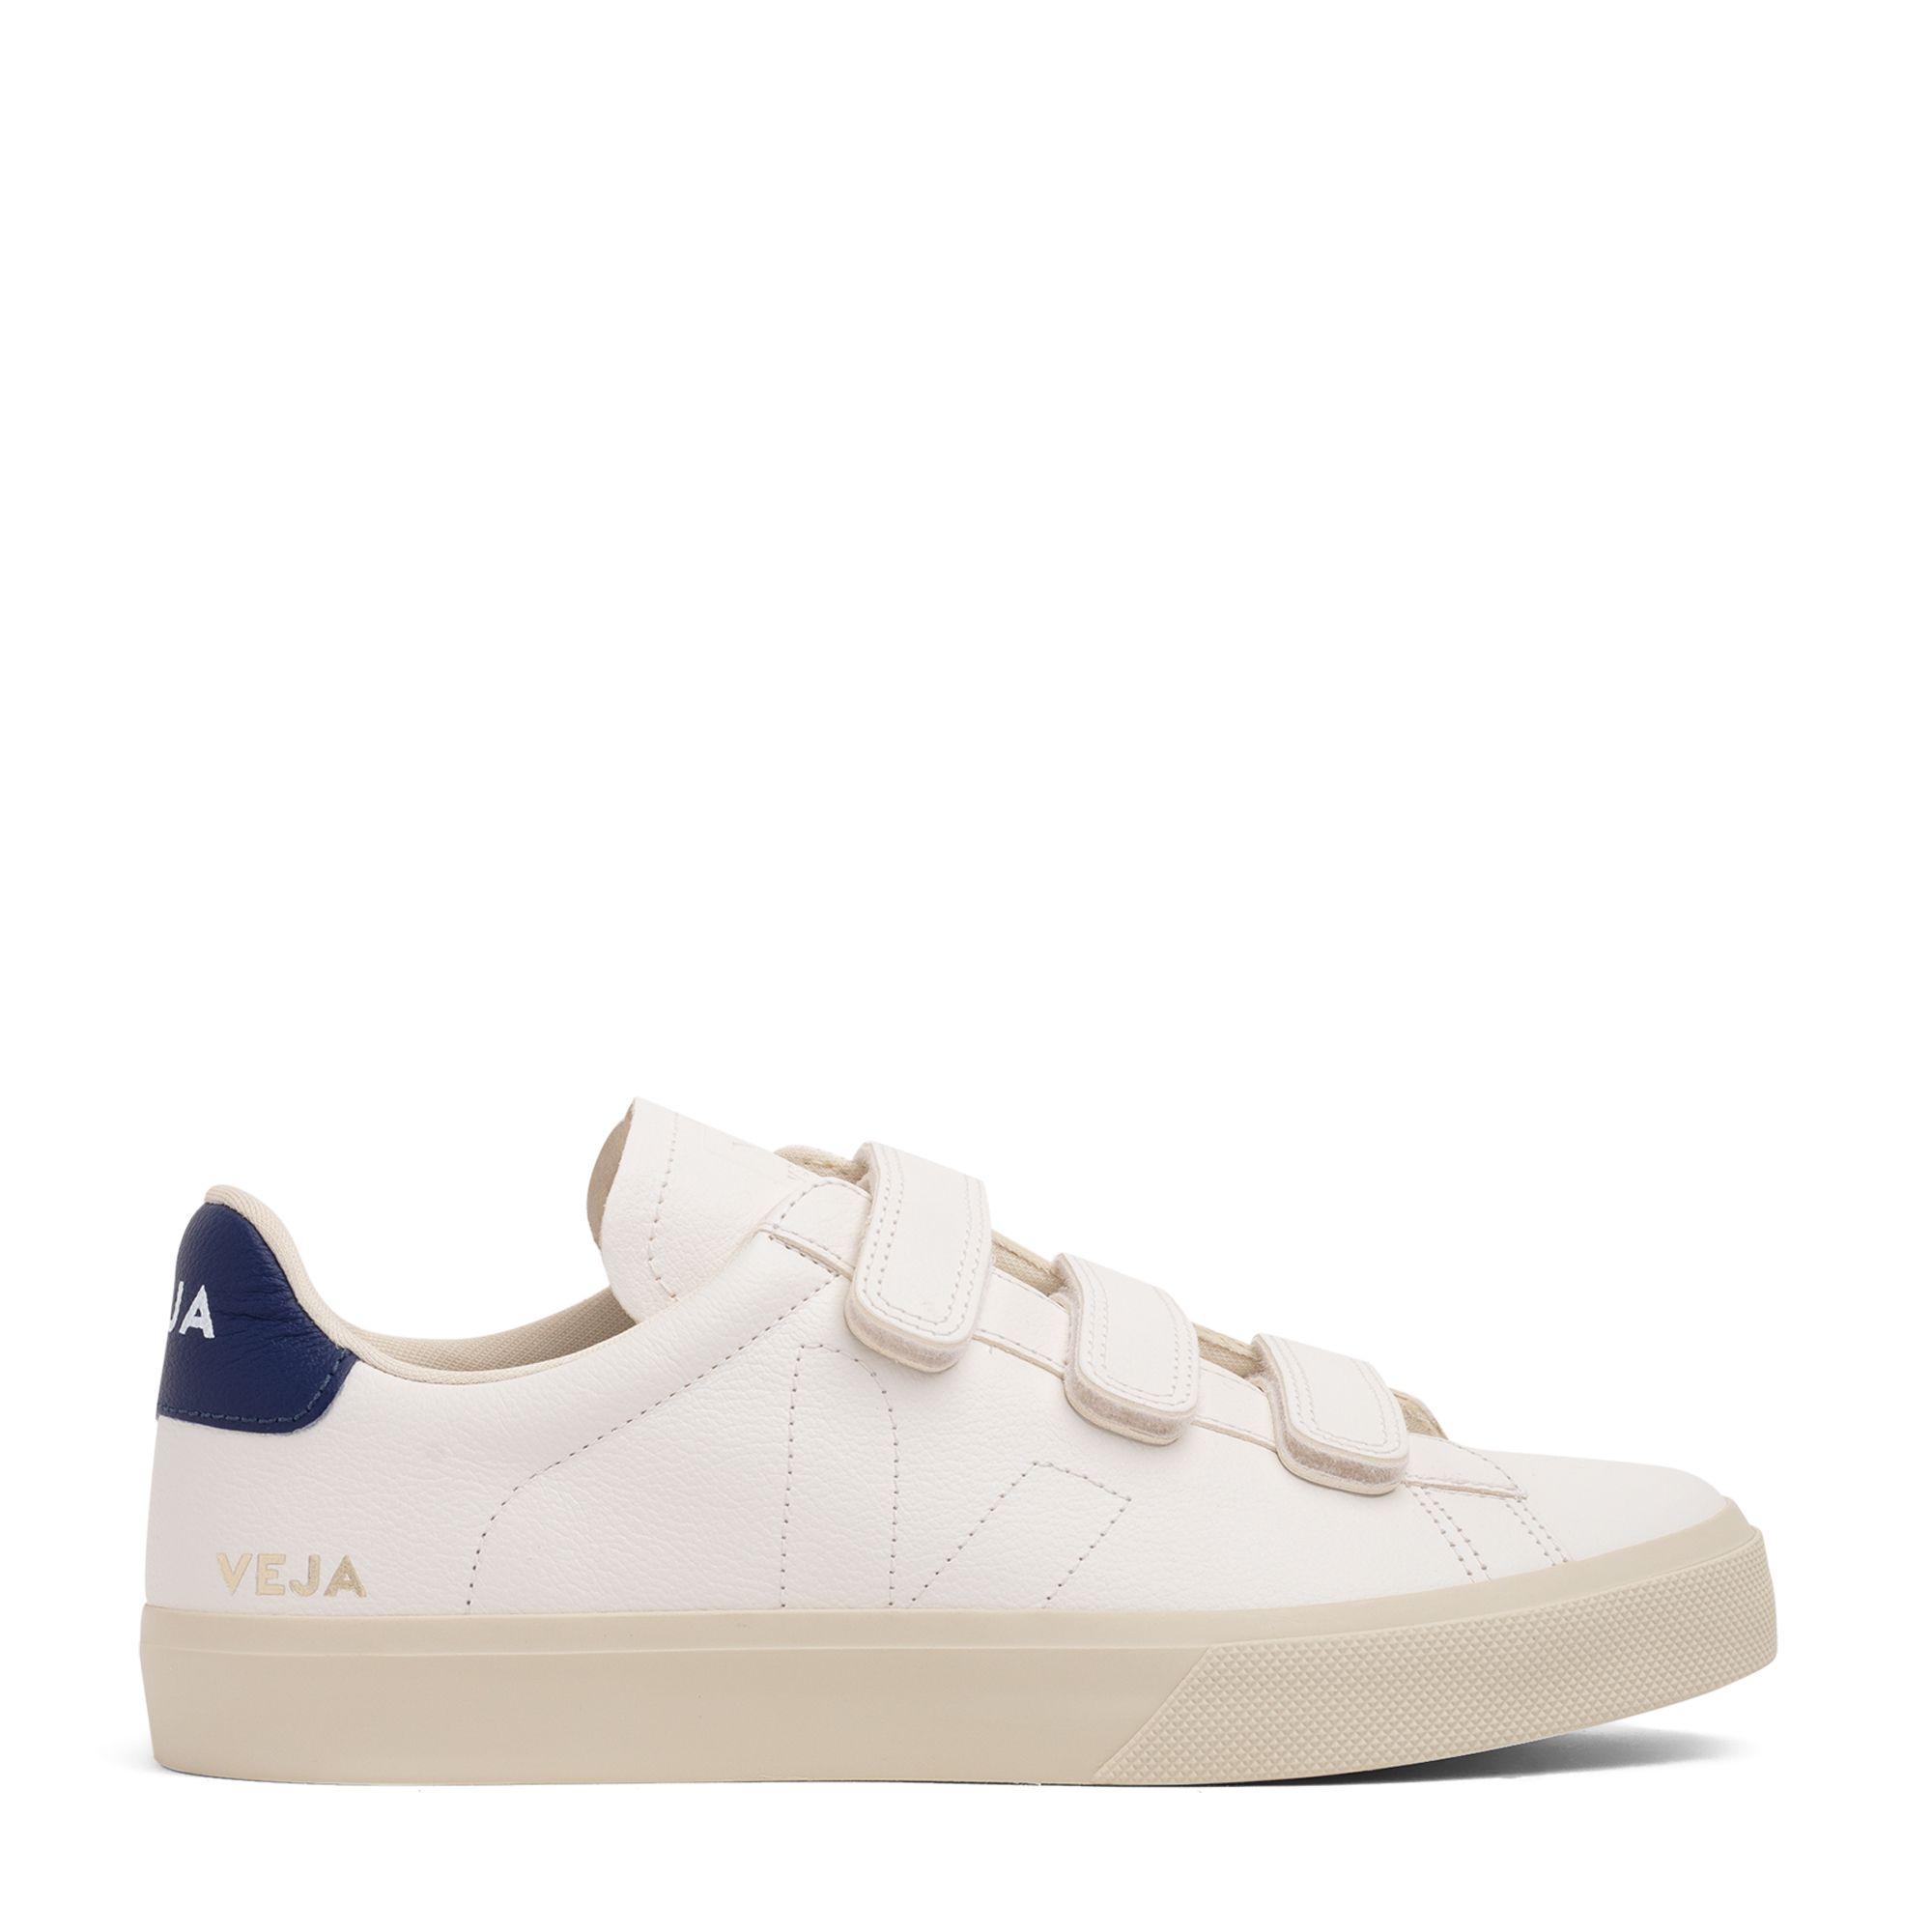 Recife sneakers